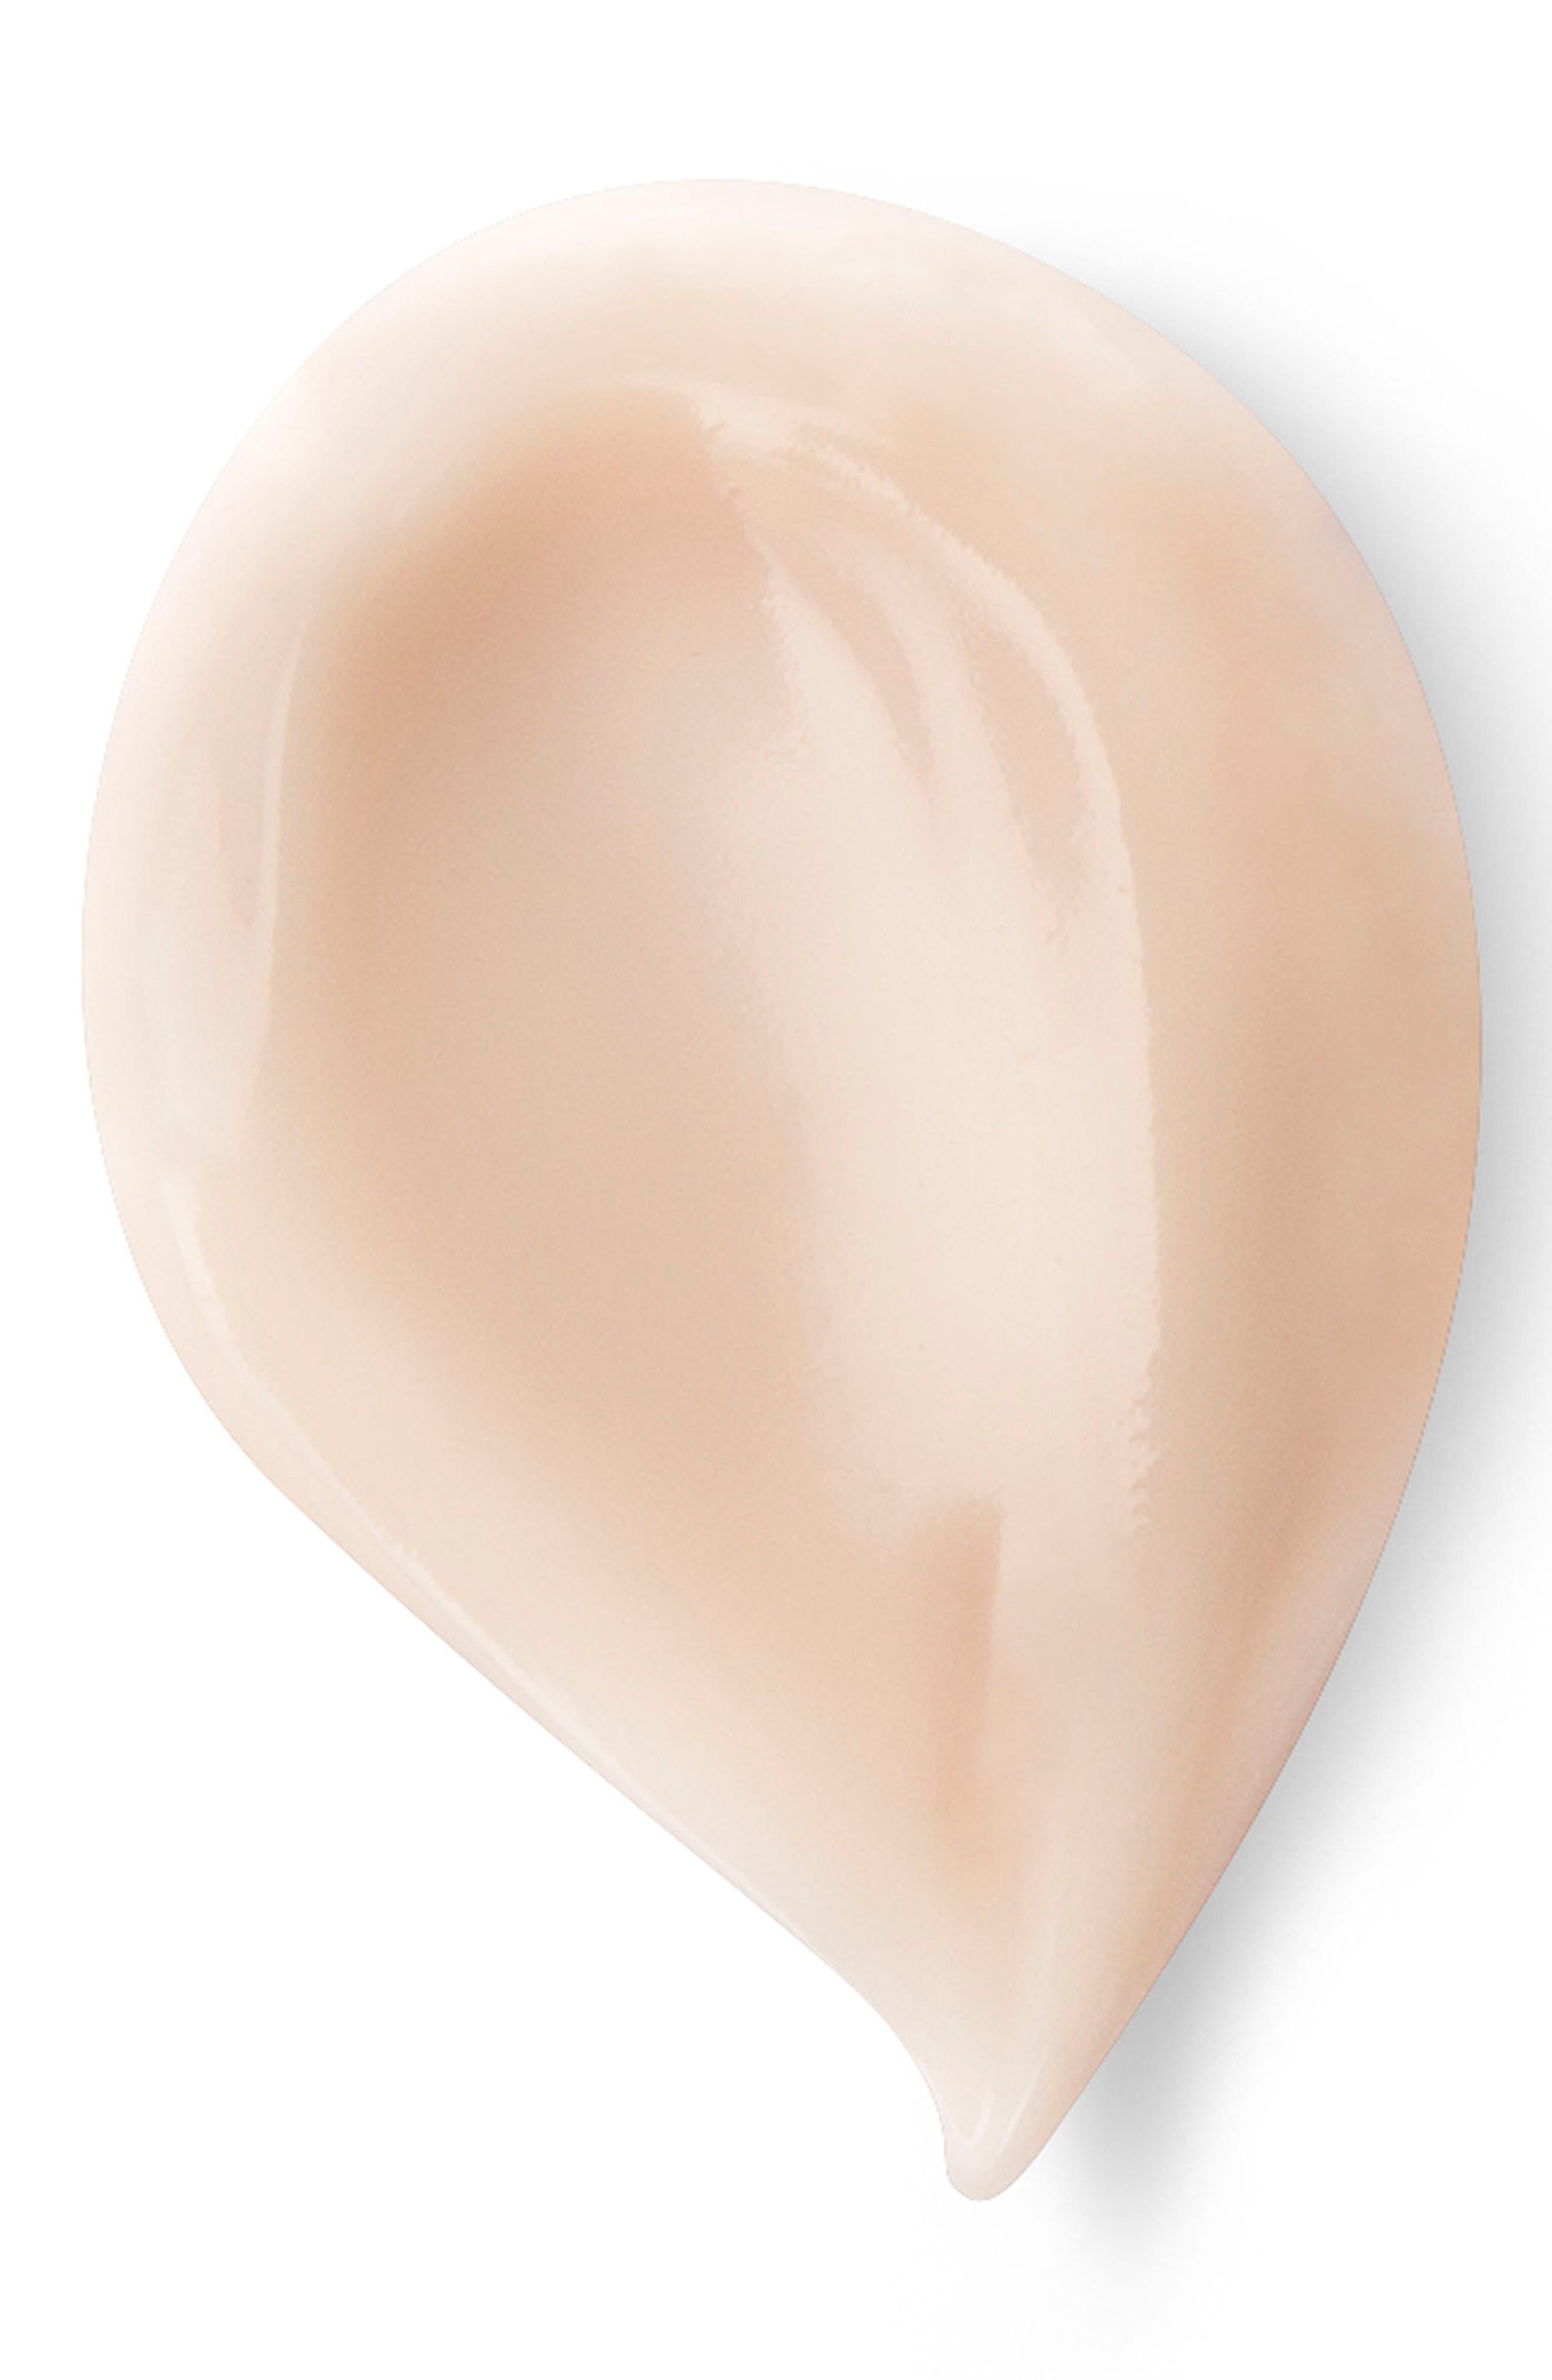 Alternate Image 3  - Sisley Paris Black Rose Skin Infusion Cream